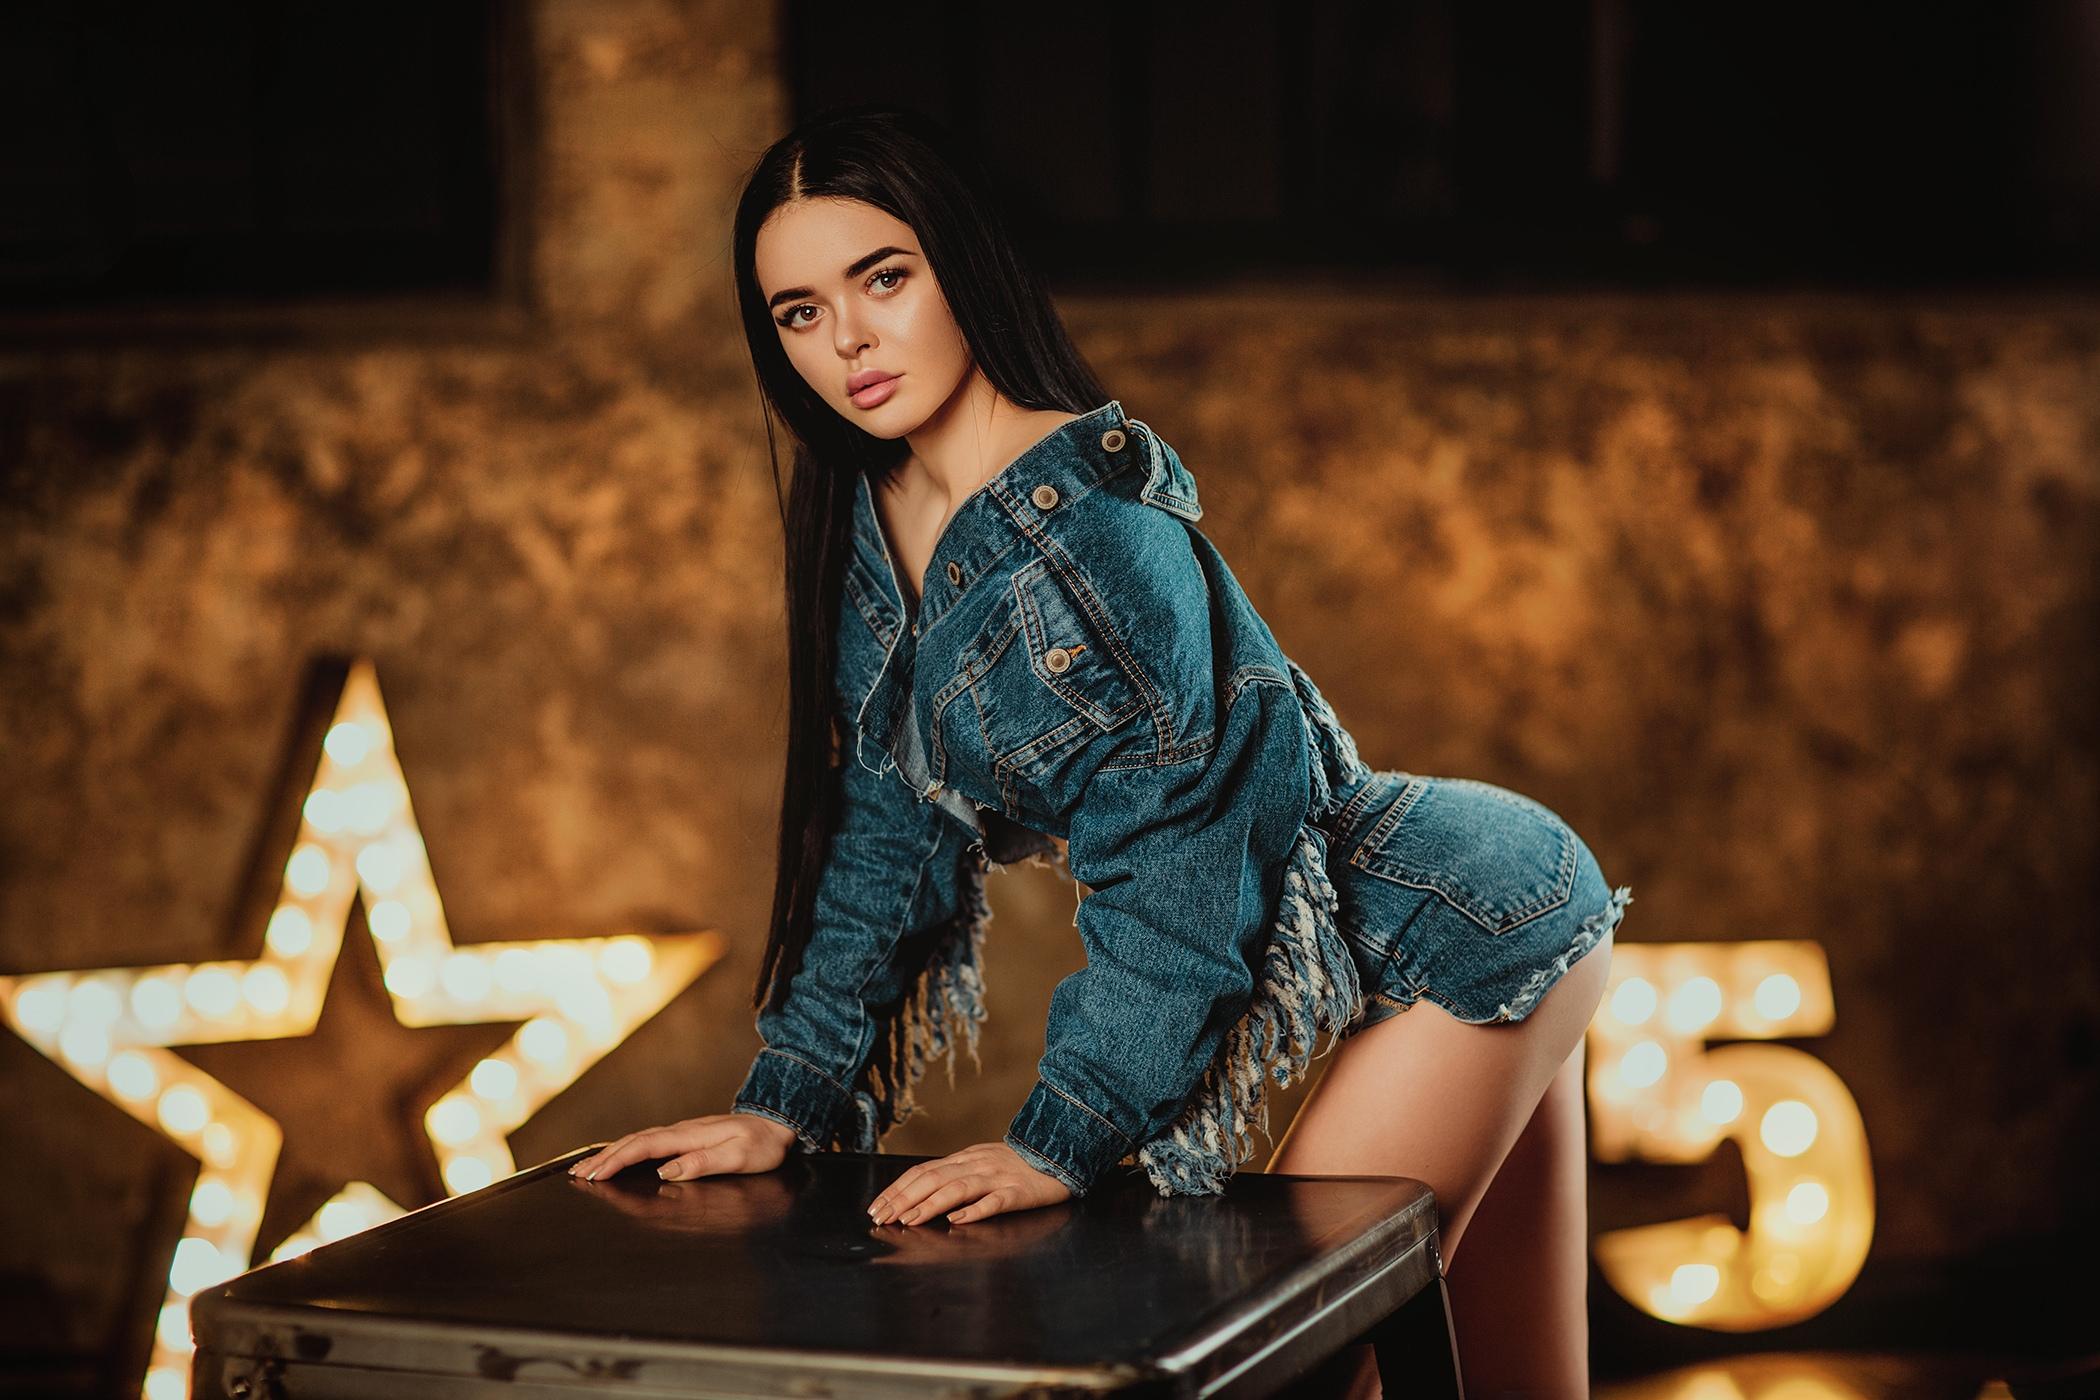 Alina Bosh Women Model Black Hair Long Hair Looking At Viewer Jeans Jacket Denim Jeans Dark Hair Jac 2100x1400